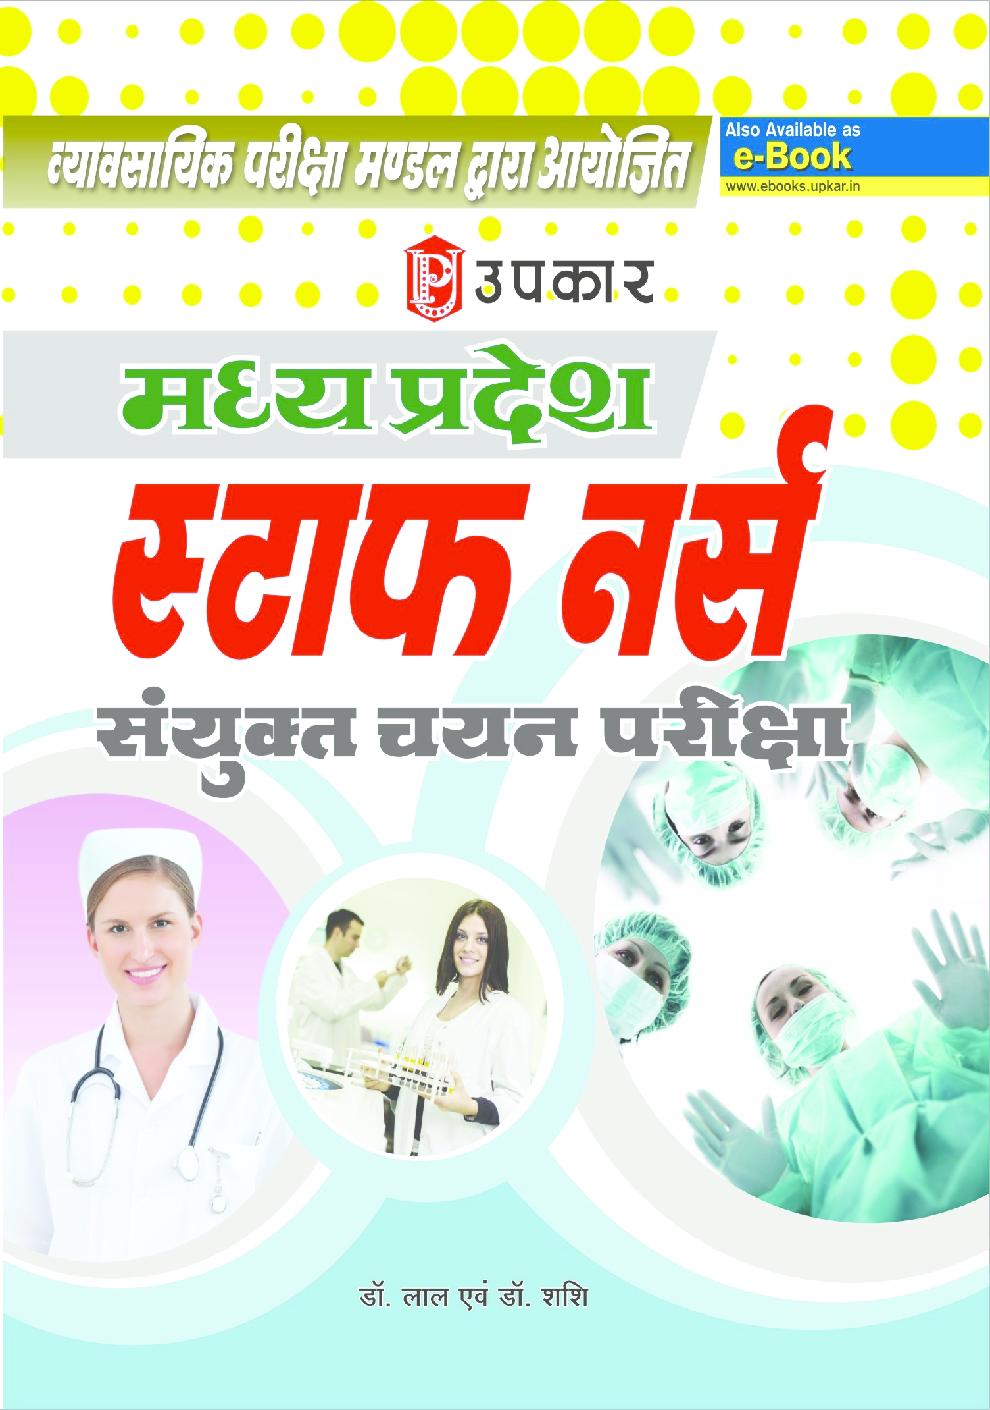 मध्य प्रदेश स्टाफ नर्स संयुक्त चयन परीक्षा - Page 1